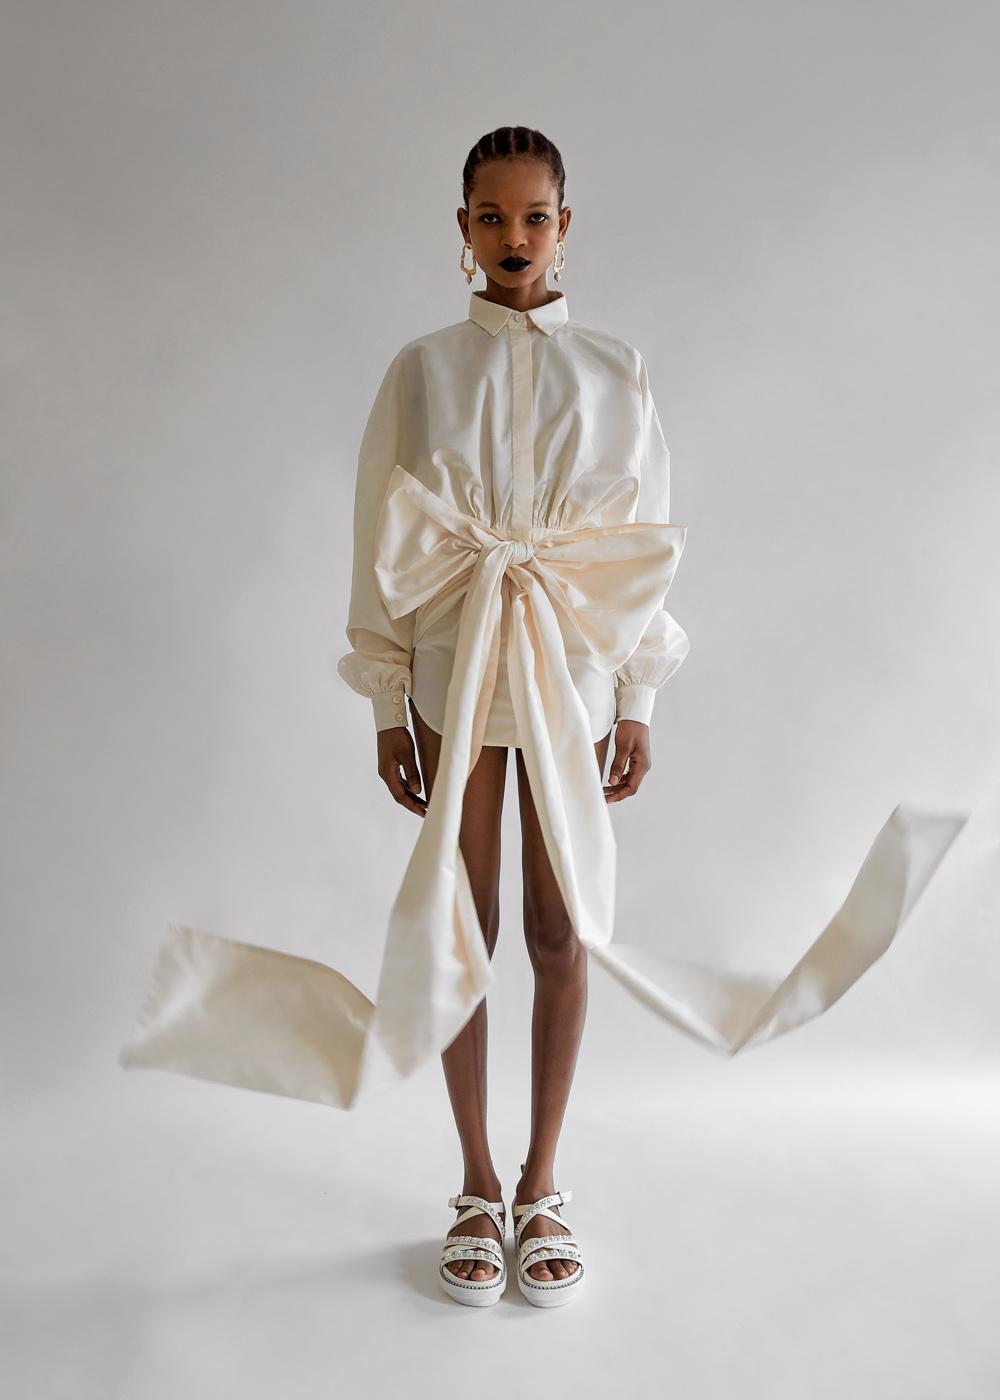 Hope Springs – Vogue Arabia, March 2021